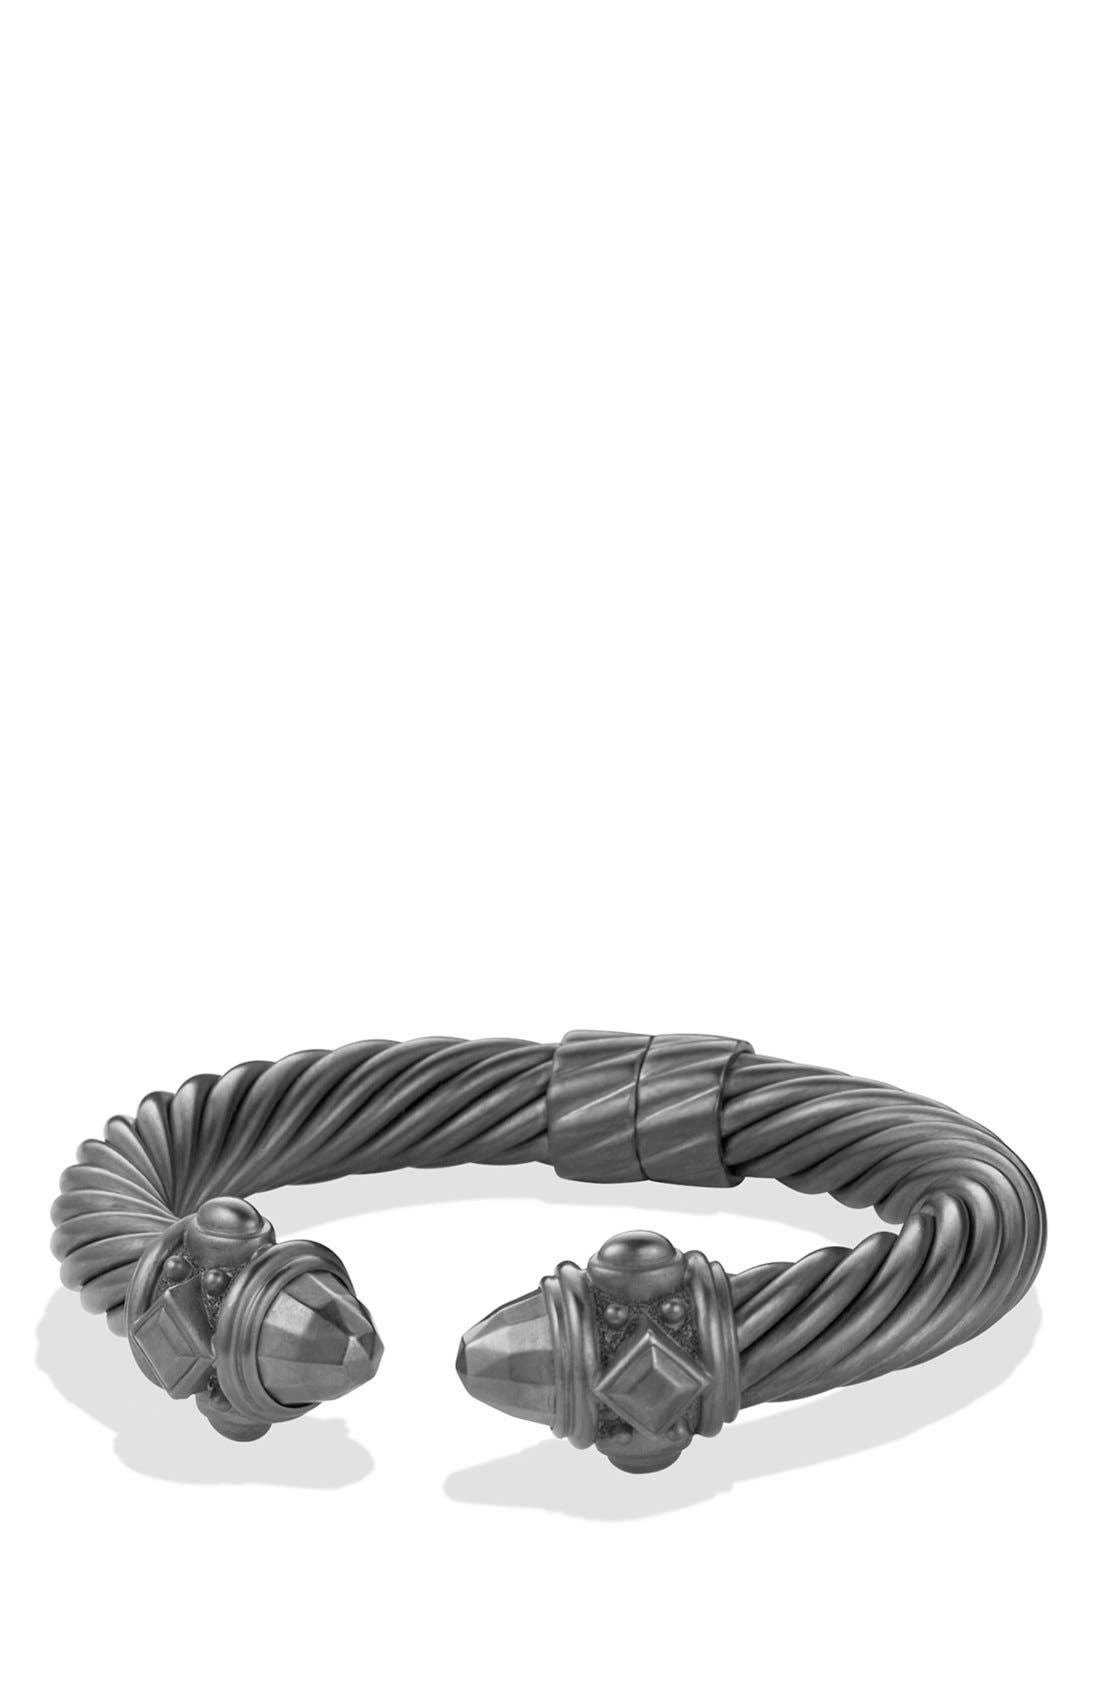 Alternate Image 1 Selected - David Yurman 'Renaissance' Bracelet